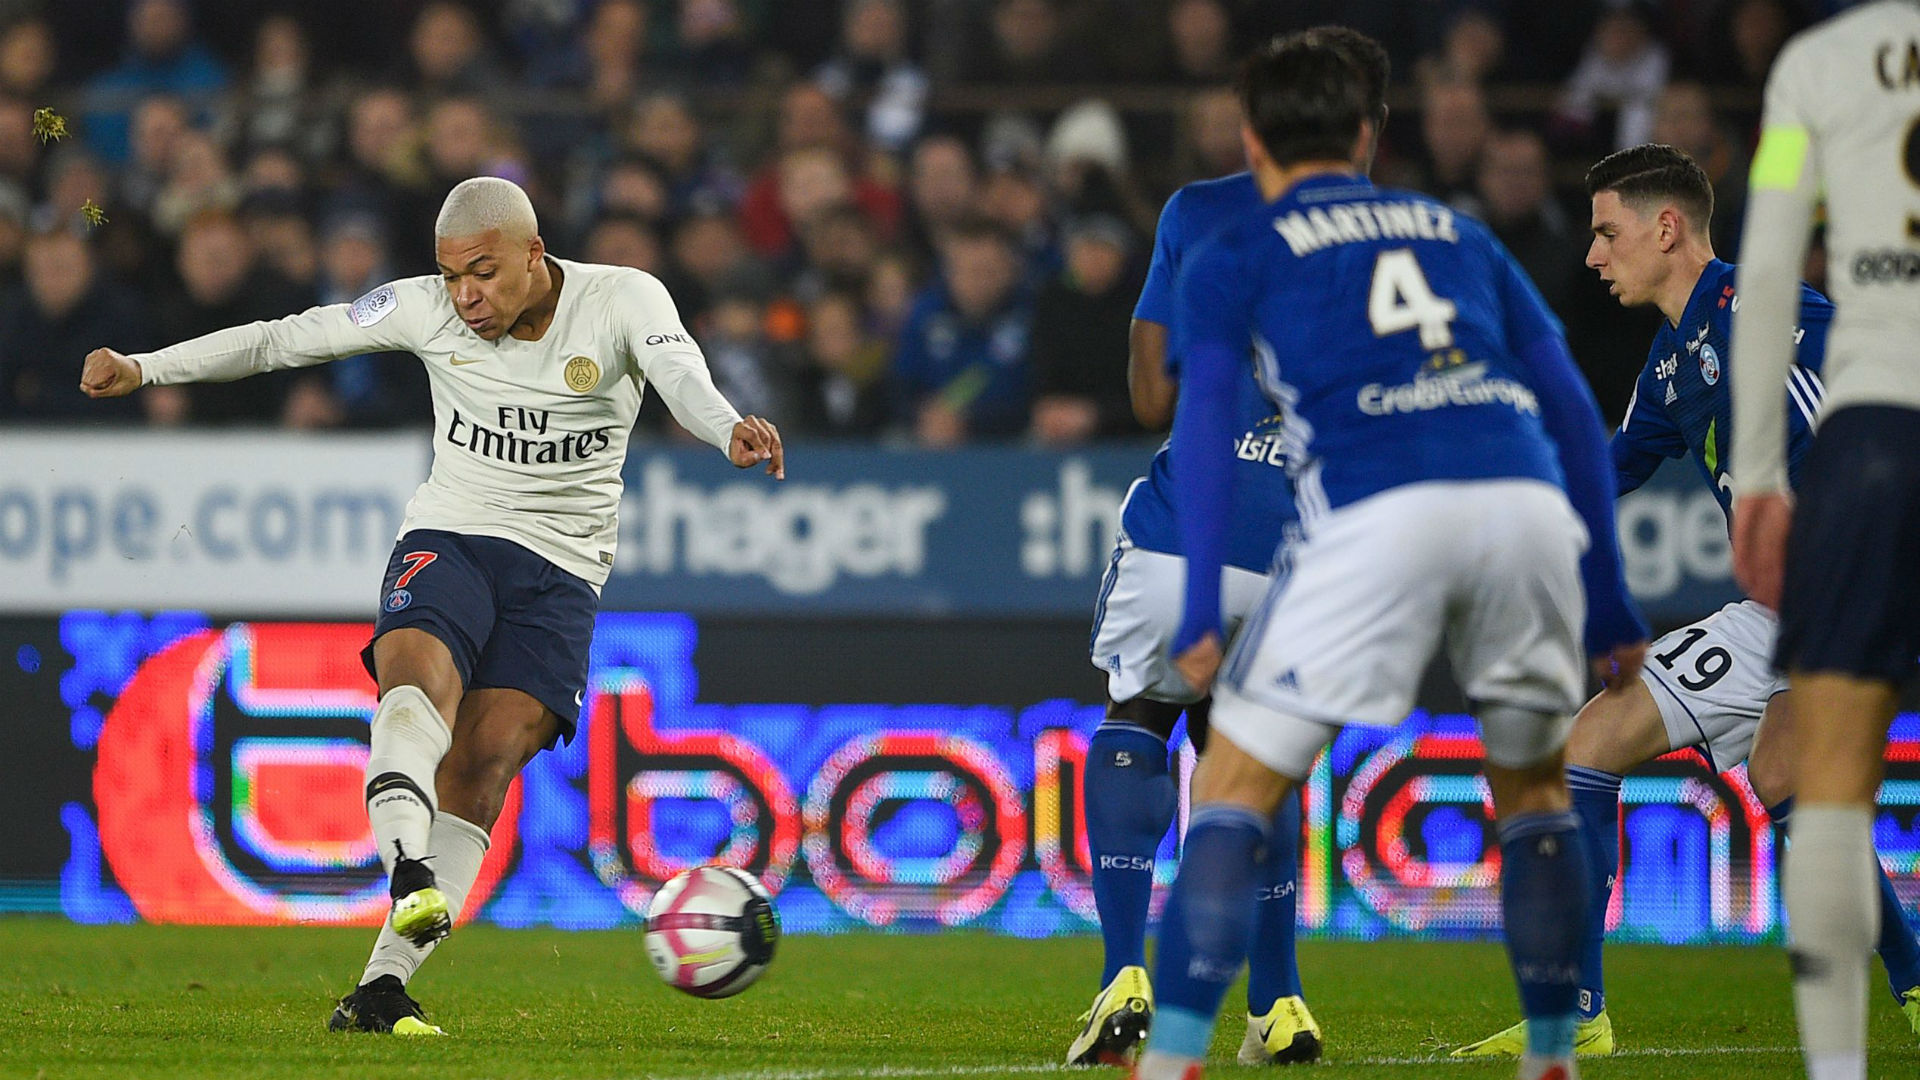 Strasbourg vs Paris Saint Germain: Prediction, Lineups, Team News, Betting Tips & Match Previews